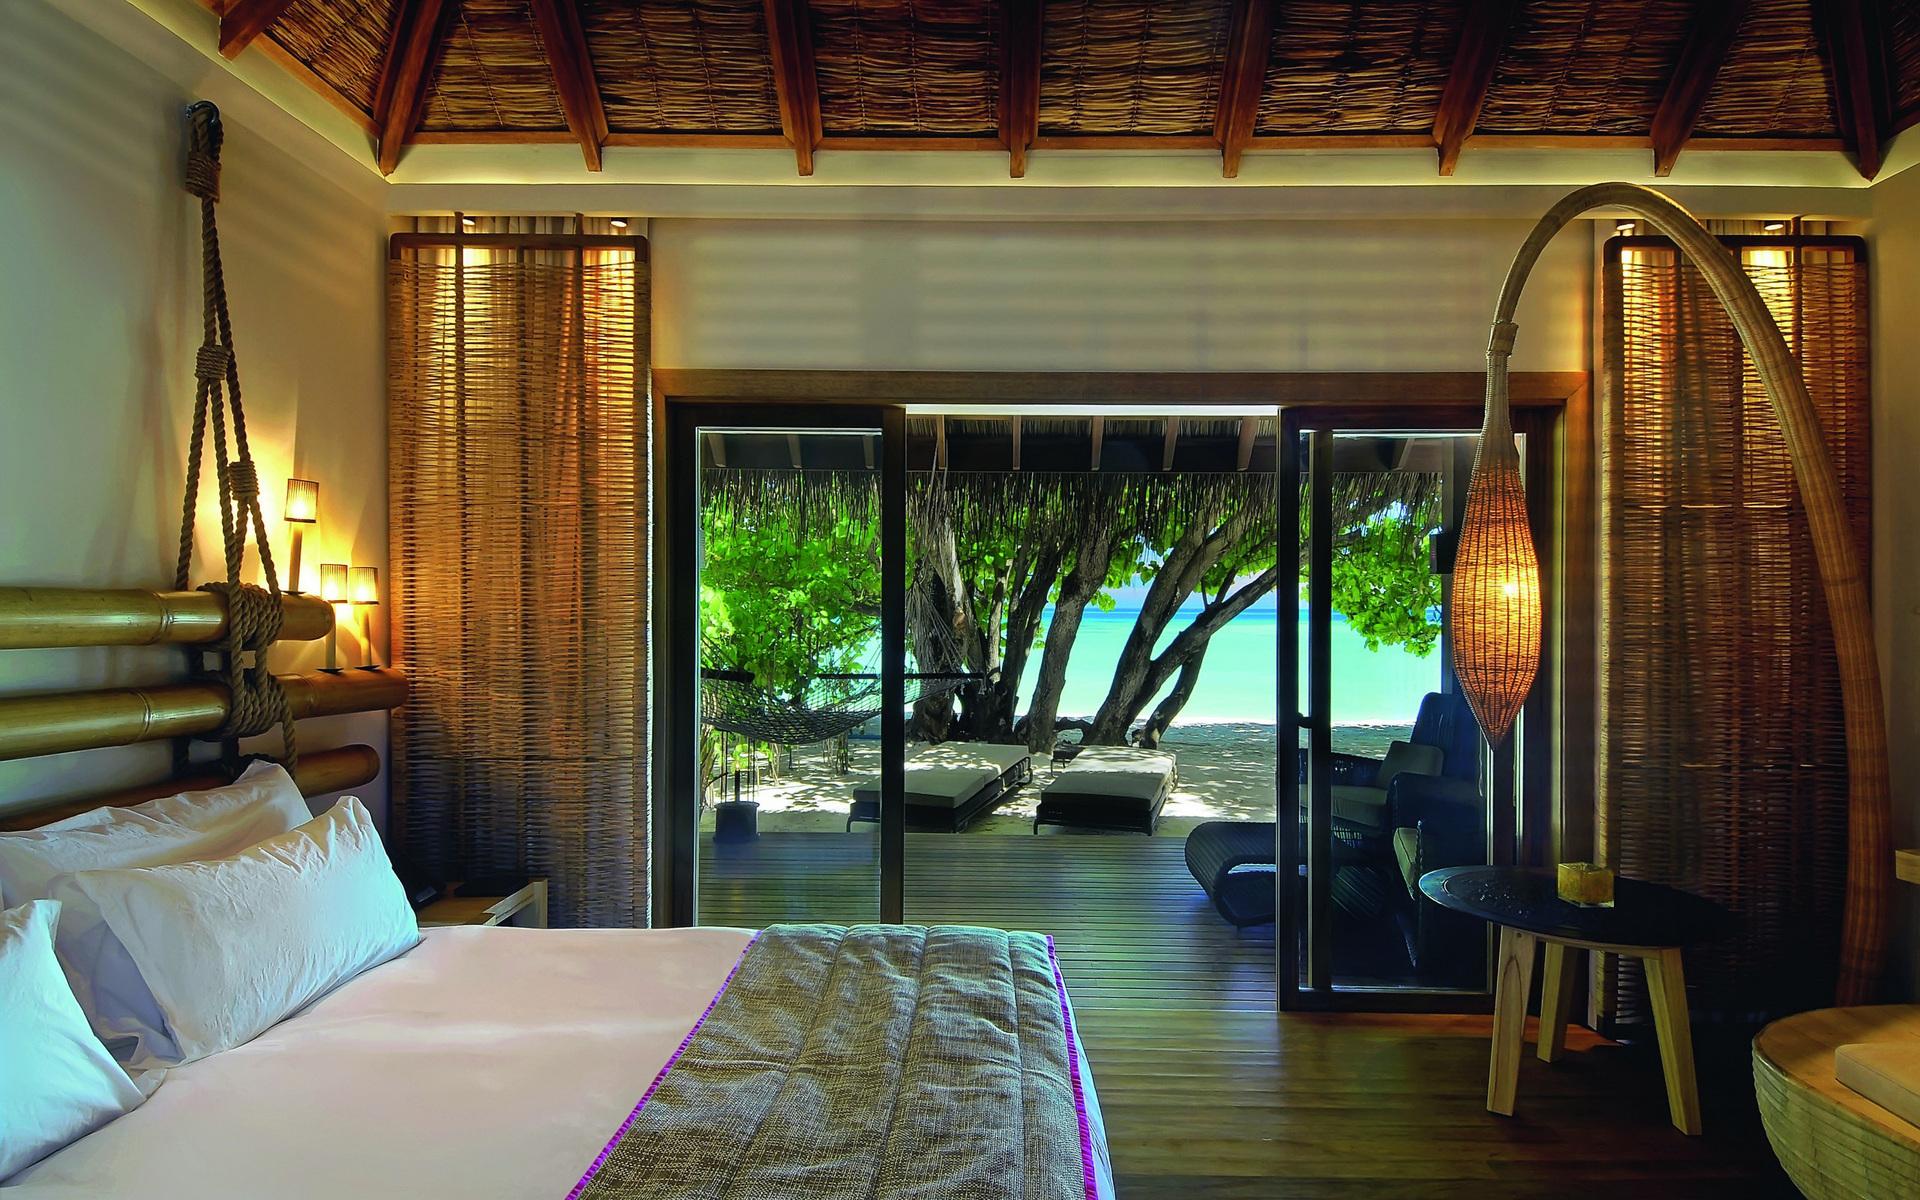 115 Bedroom HD Wallpapers | Background Images - Wallpaper ...